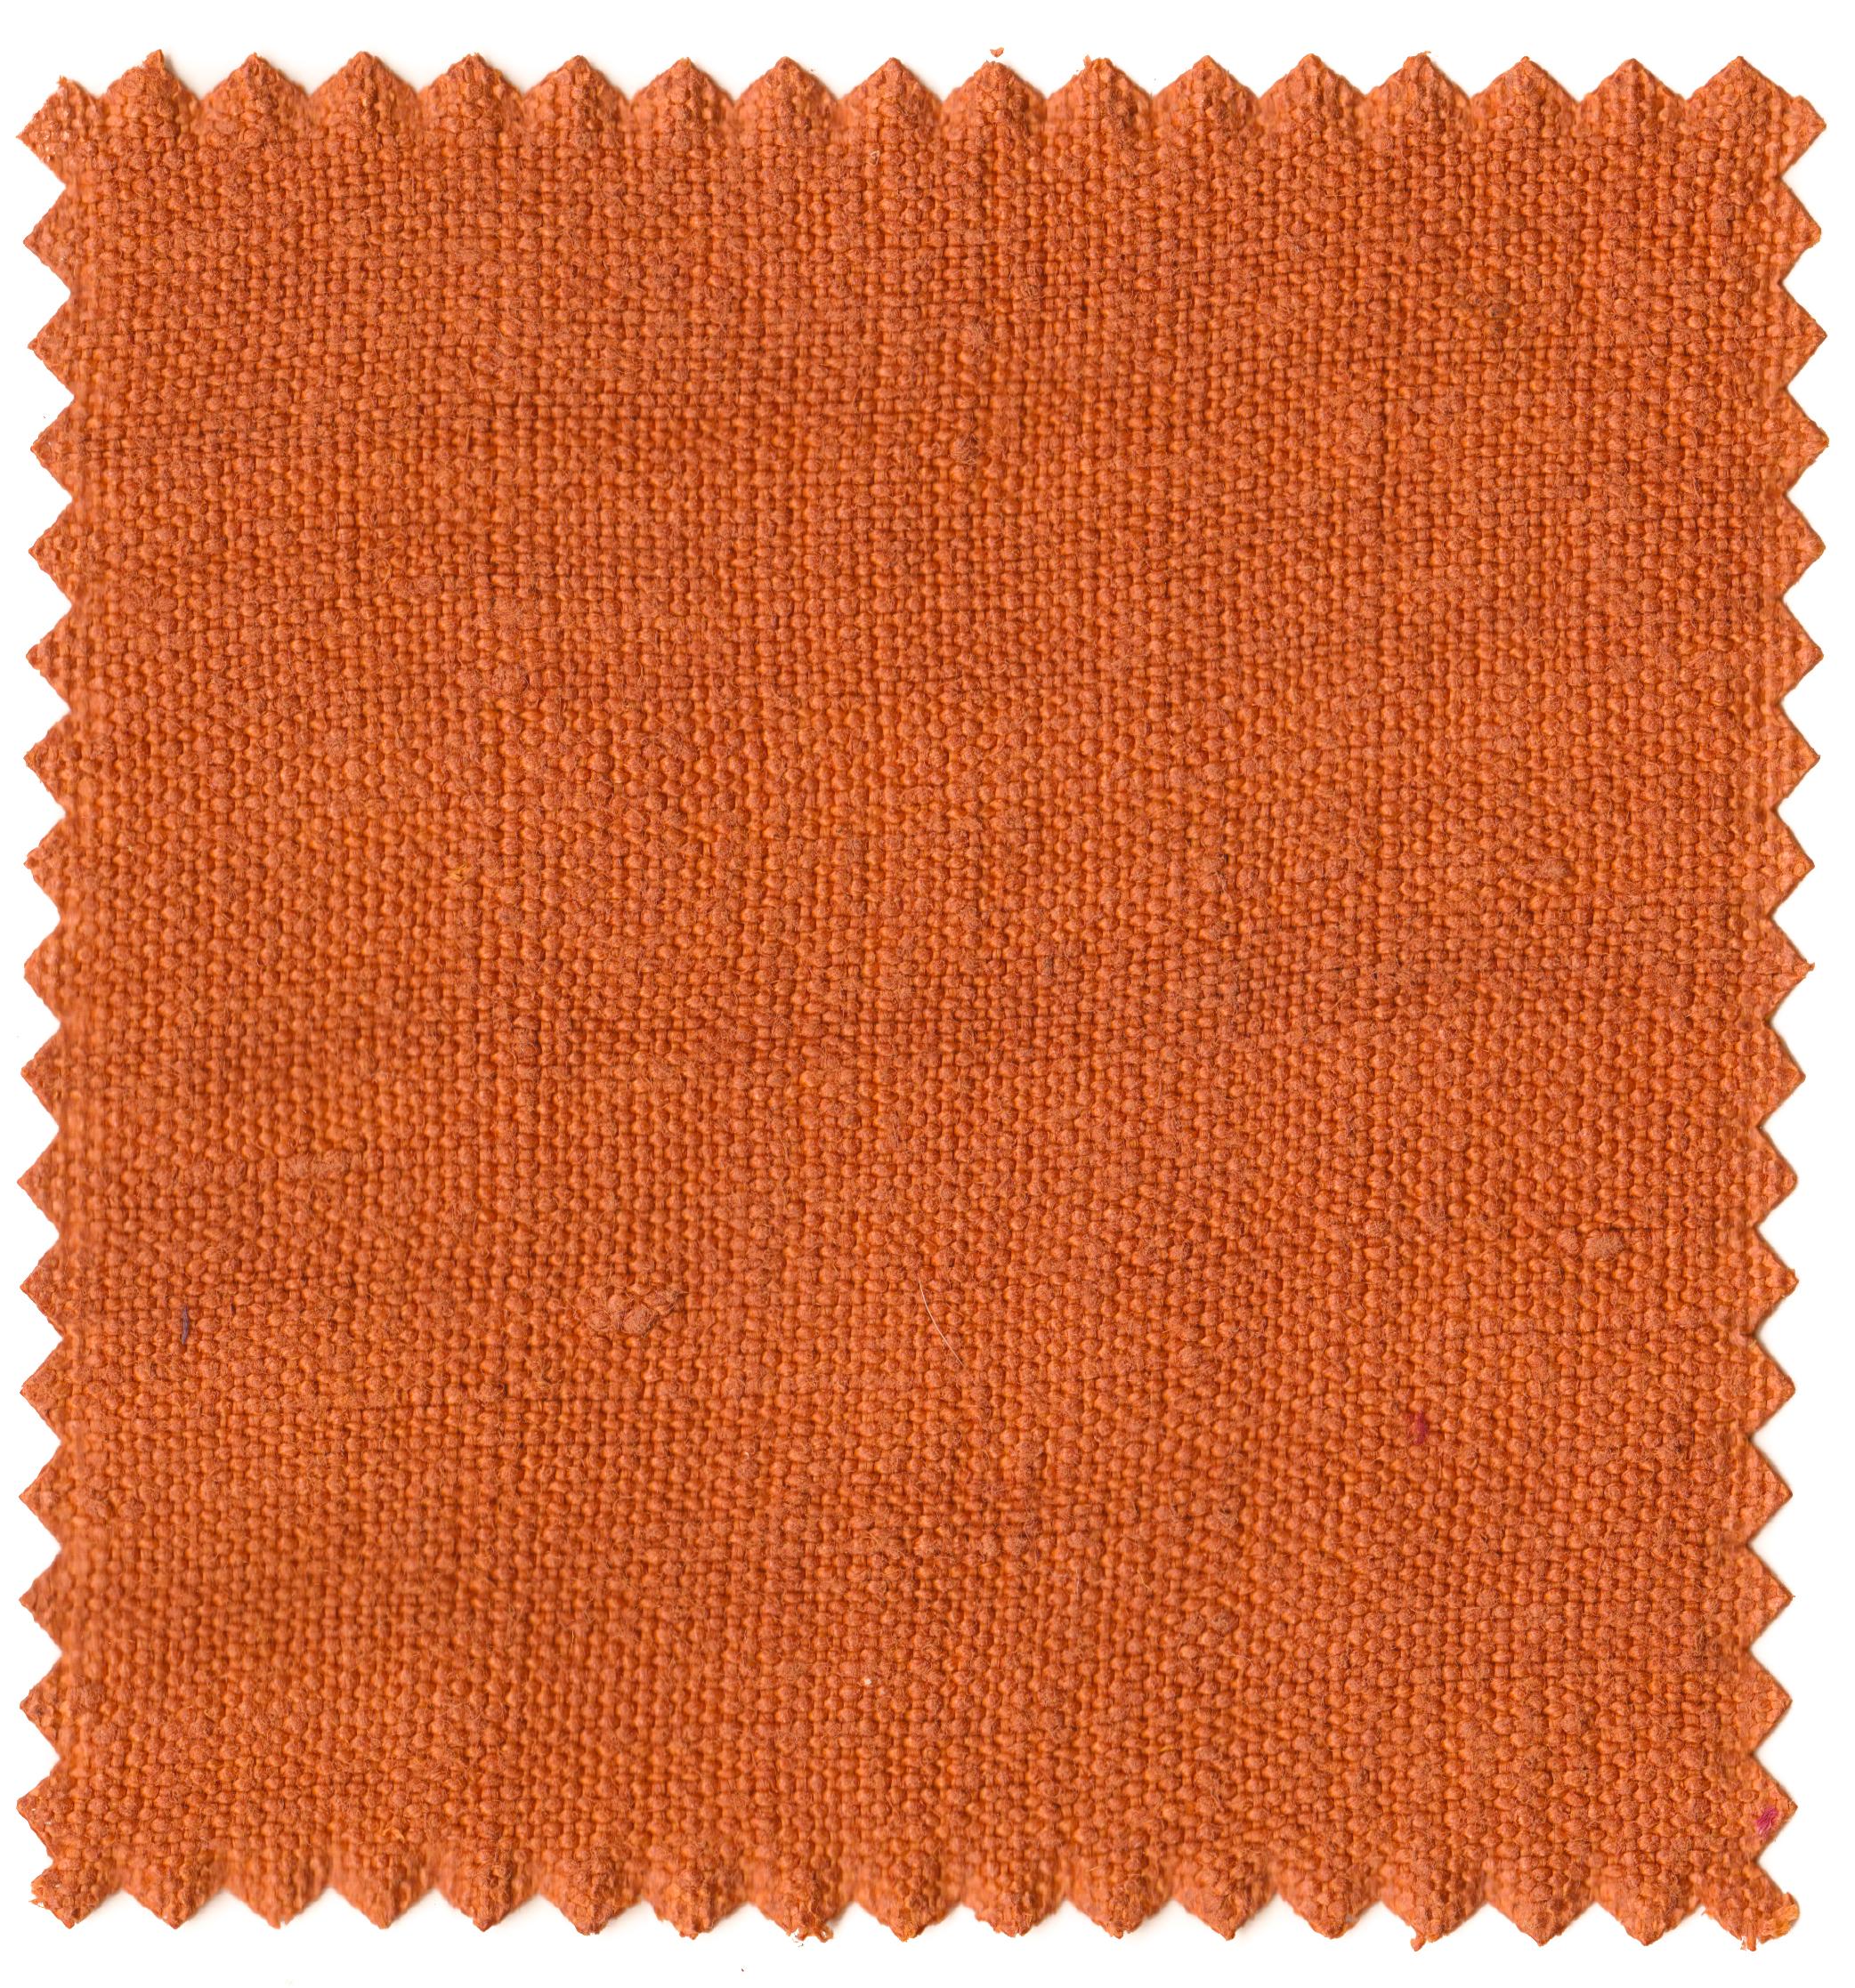 Saffron Umbers-6.jpg